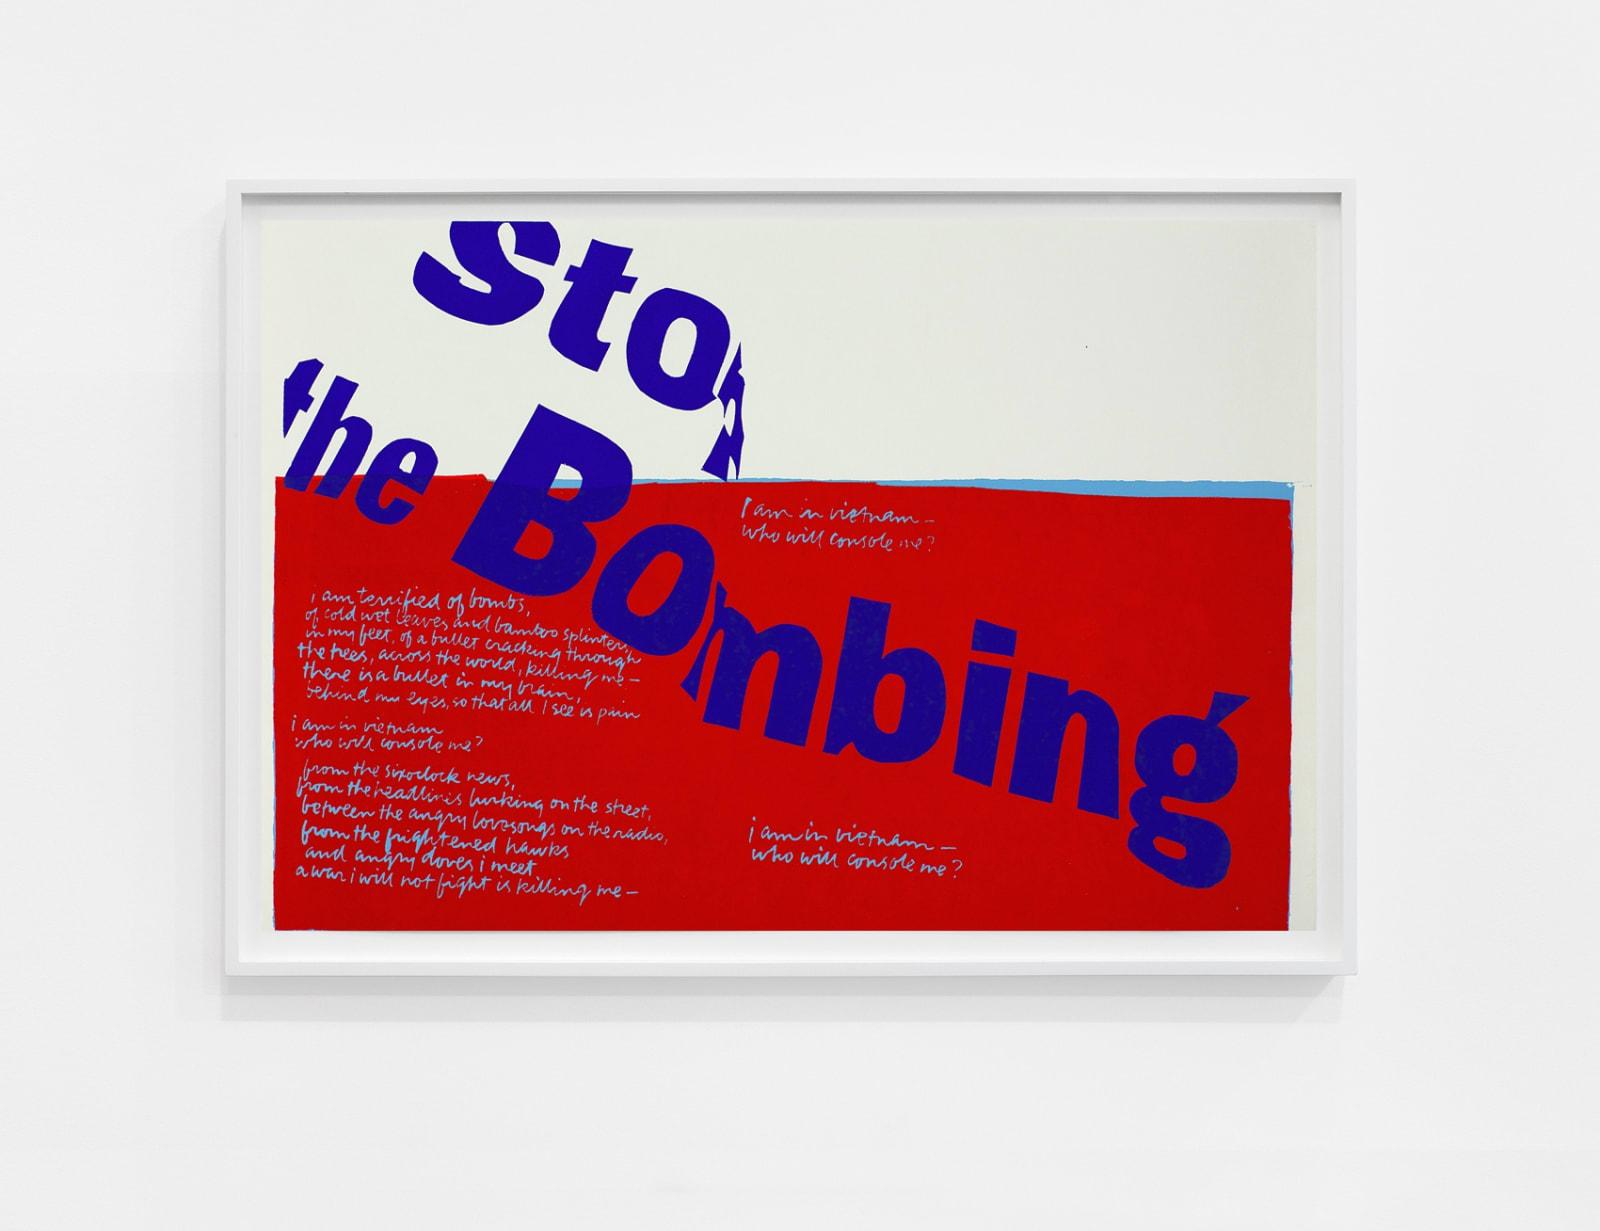 Corita Kent stop the bombing, 1967 Screenprint framed: 18 3/4 x 26 in (47.6 x 66 cm)